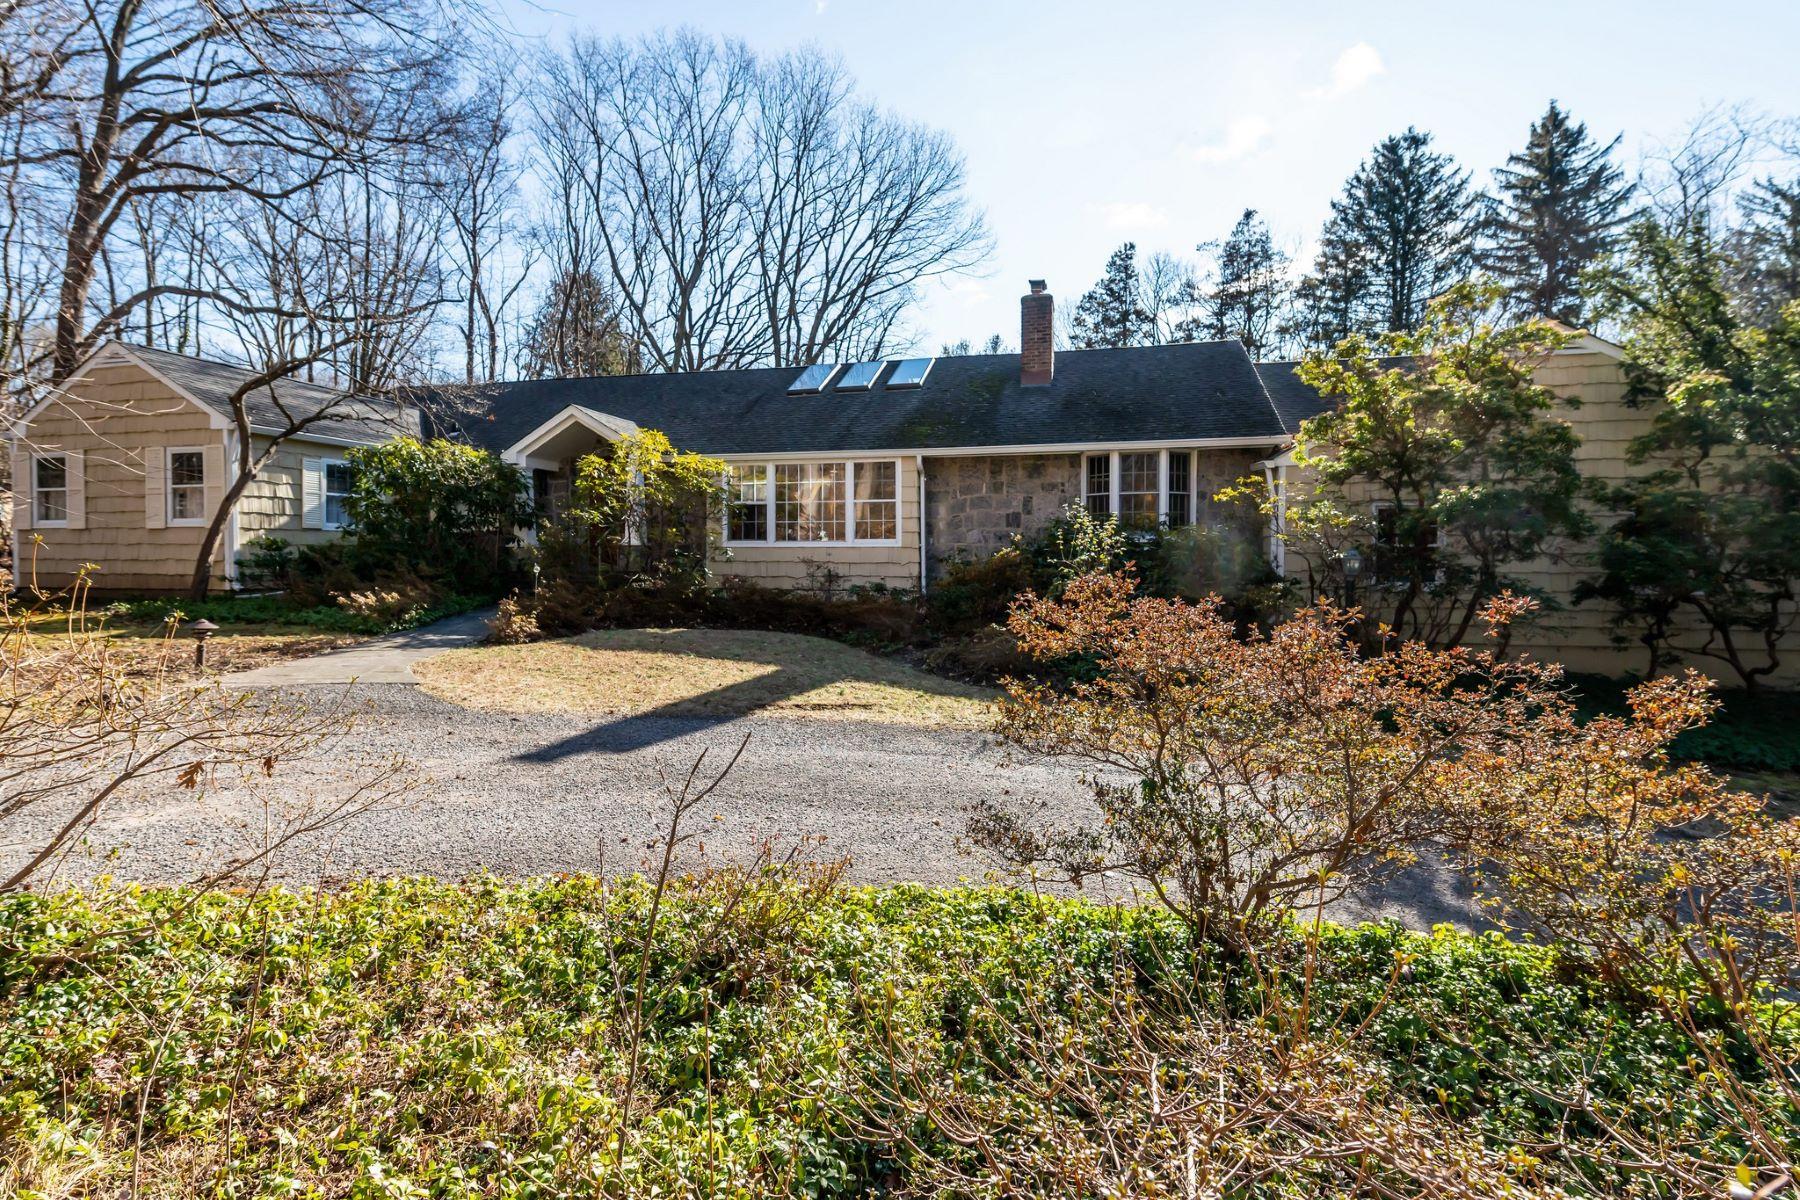 Single Family Homes for Active at Lattingtown 16 Meudon Lattingtown, New York 11560 United States